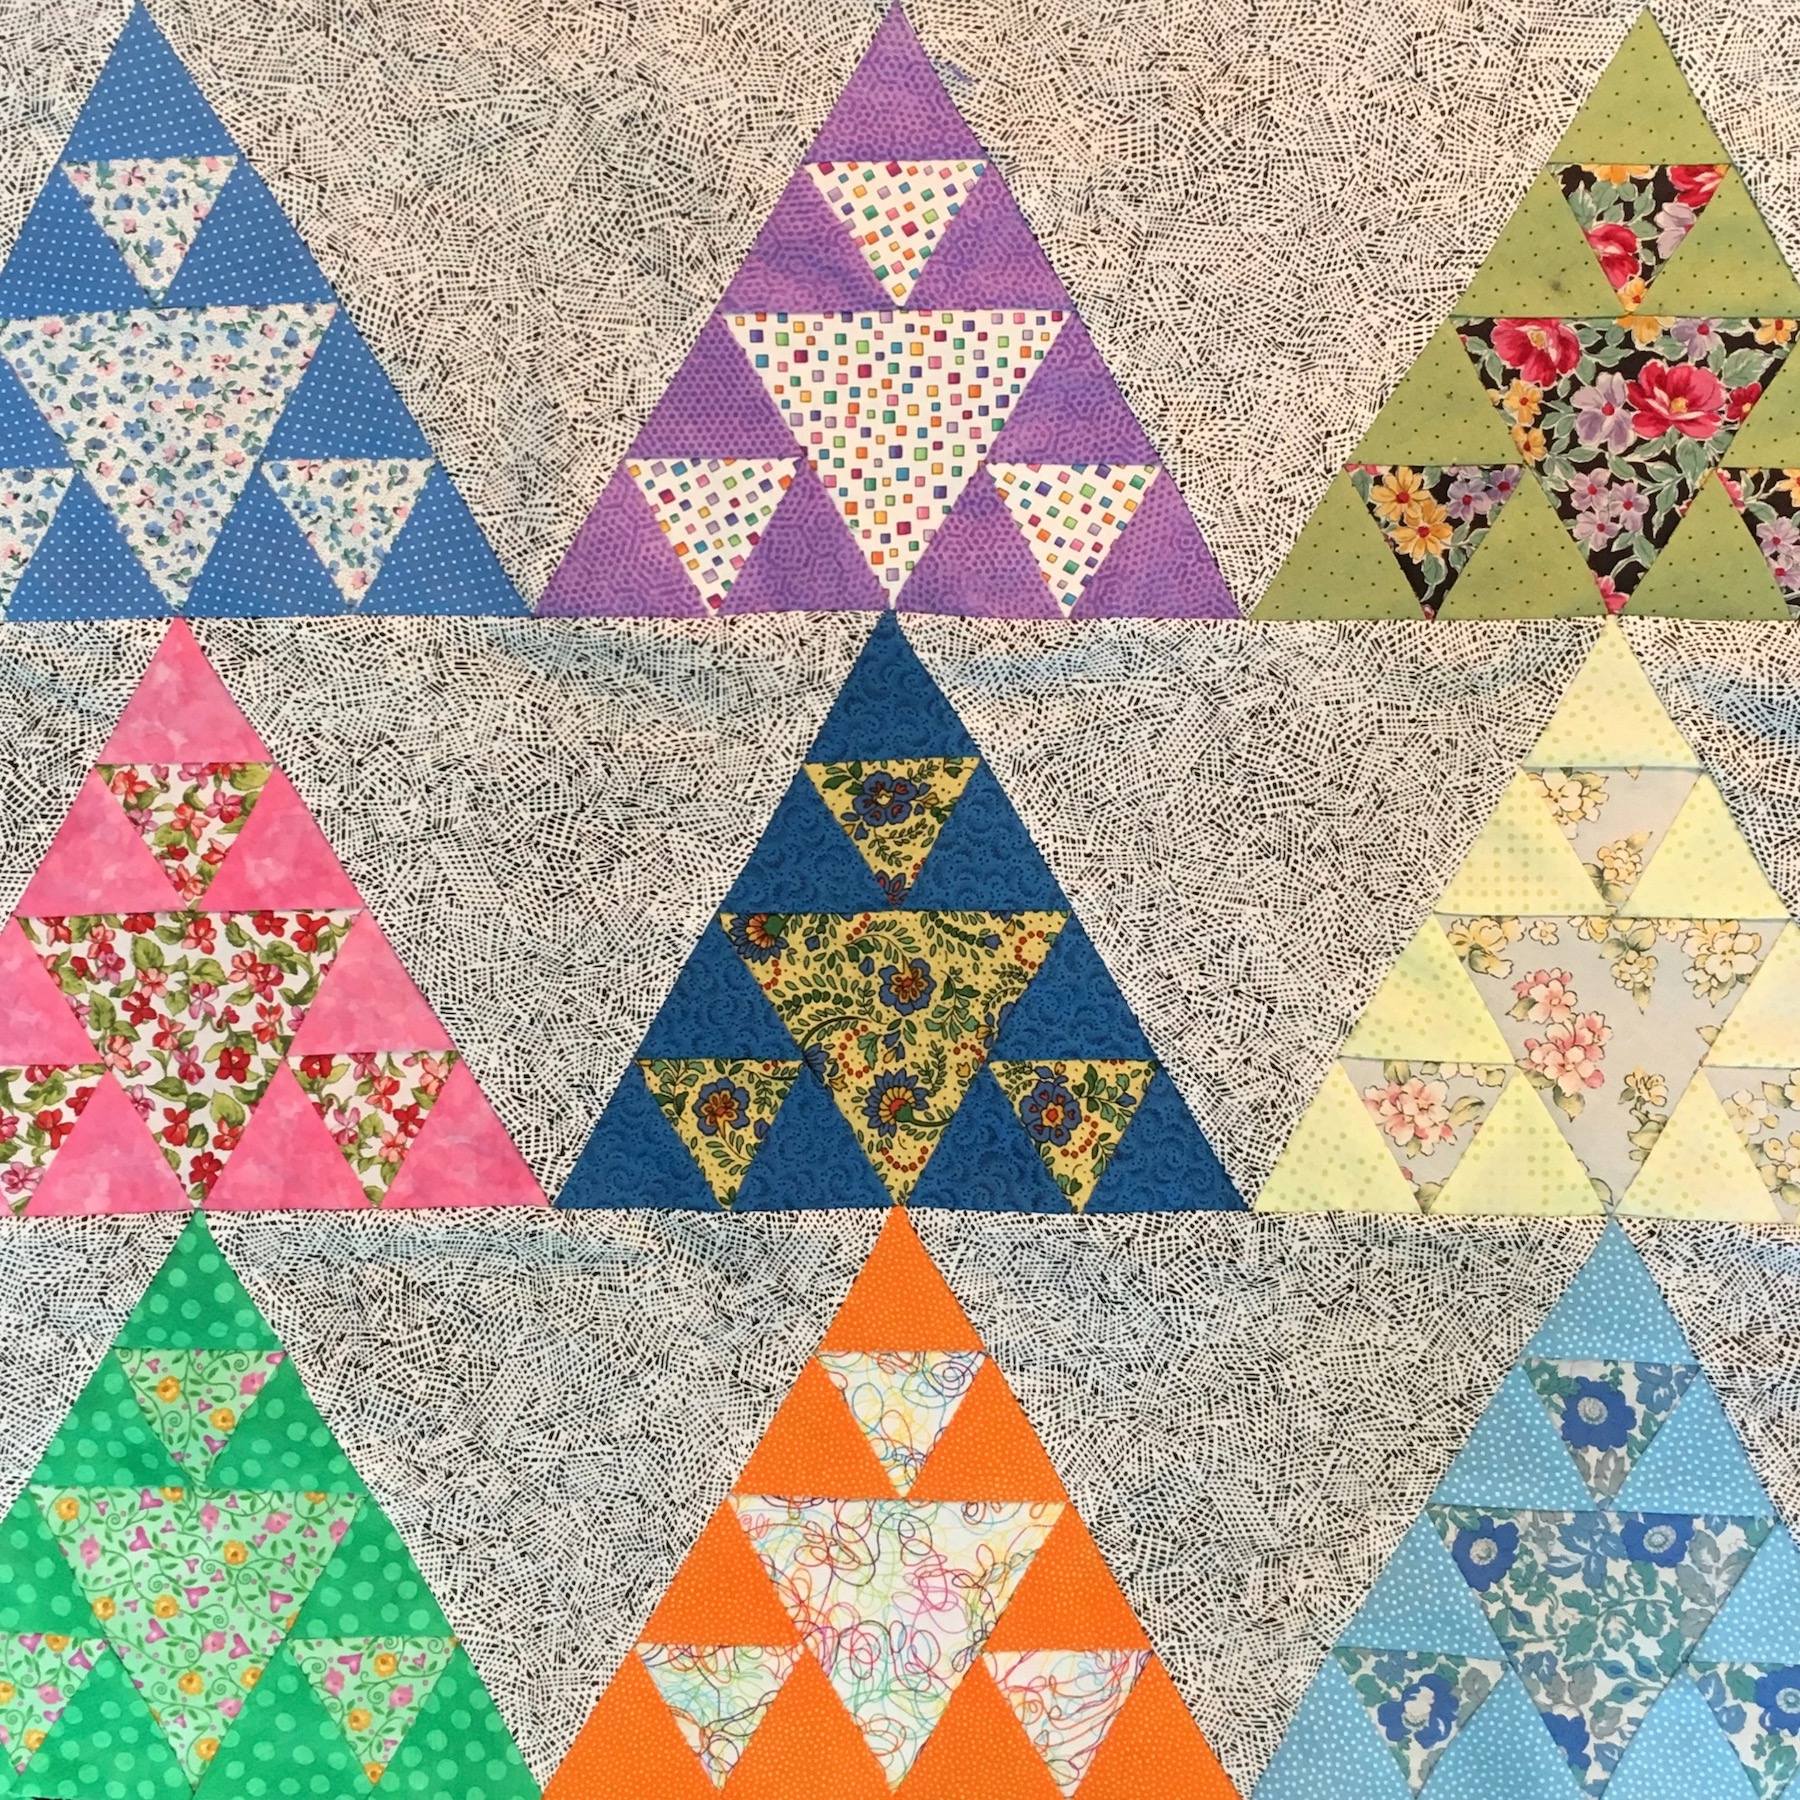 Thousandpyramids1.jpg